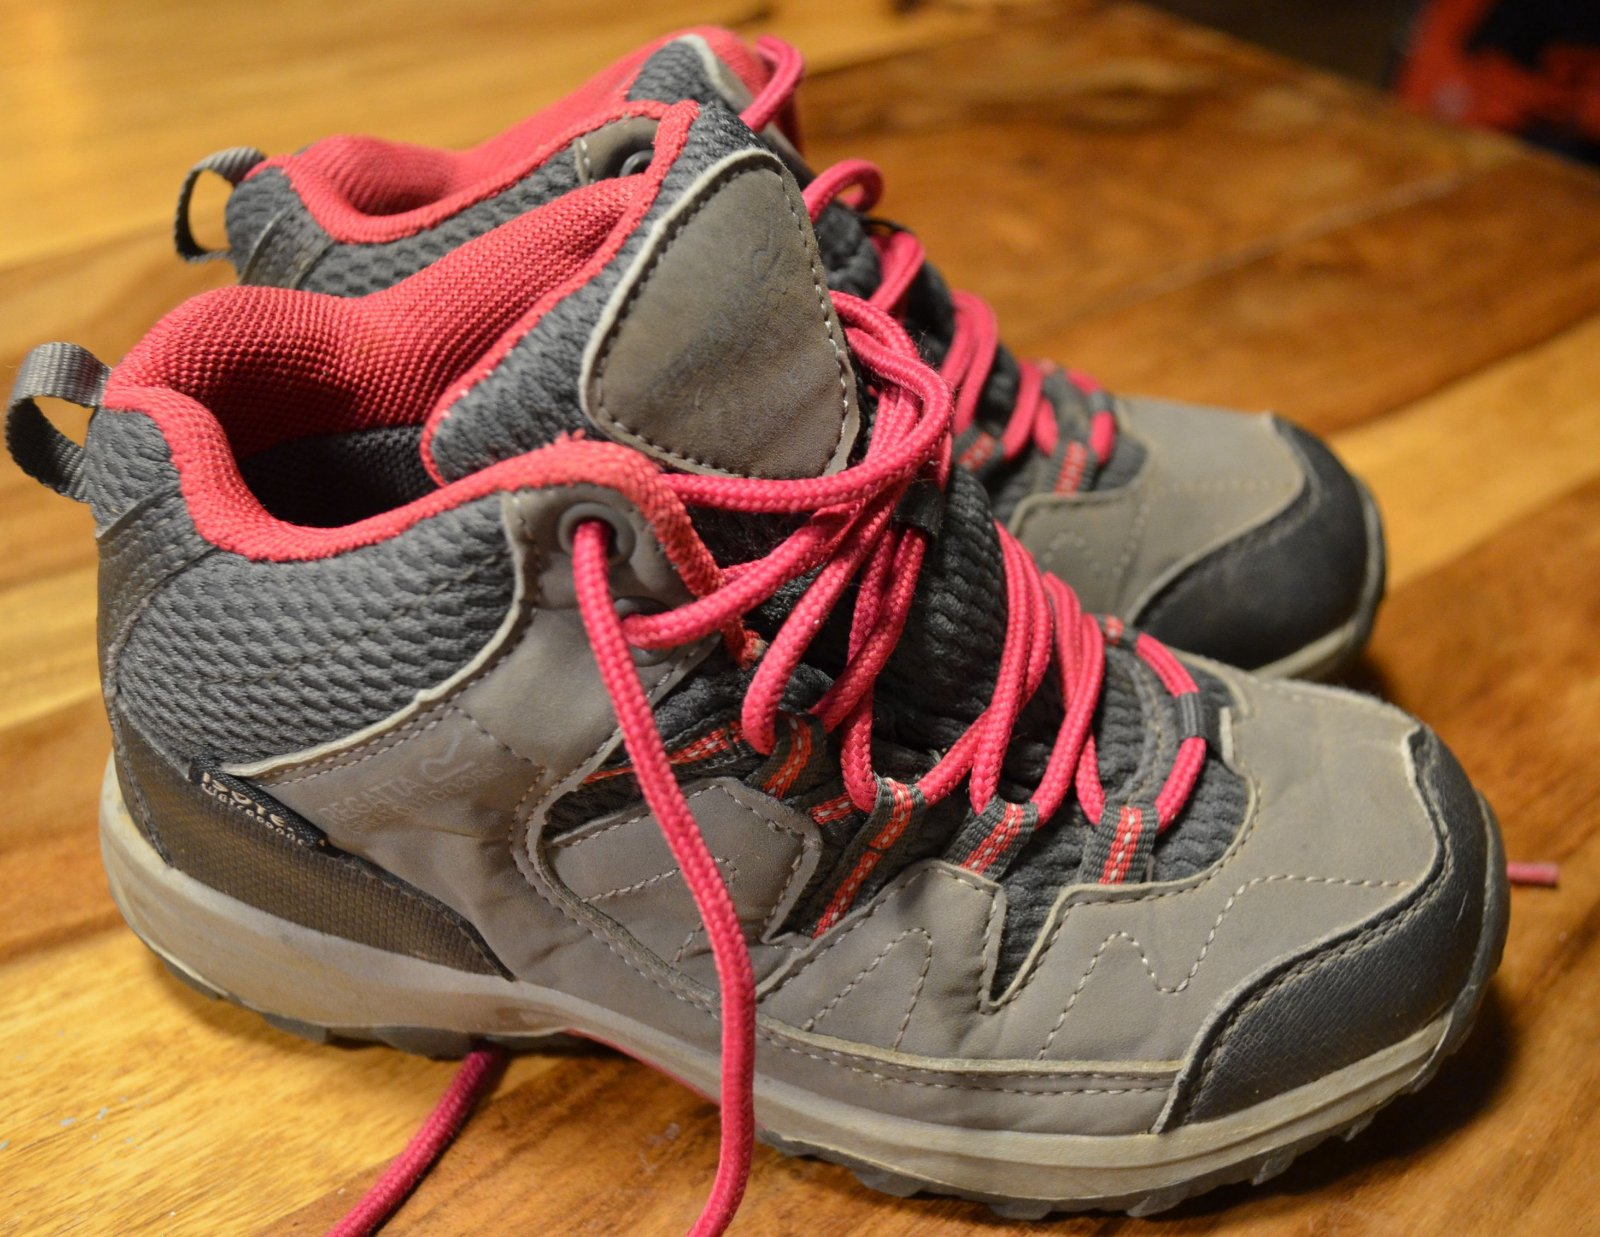 d81f763fe0fc Jesenné topánky kvalitnej značky